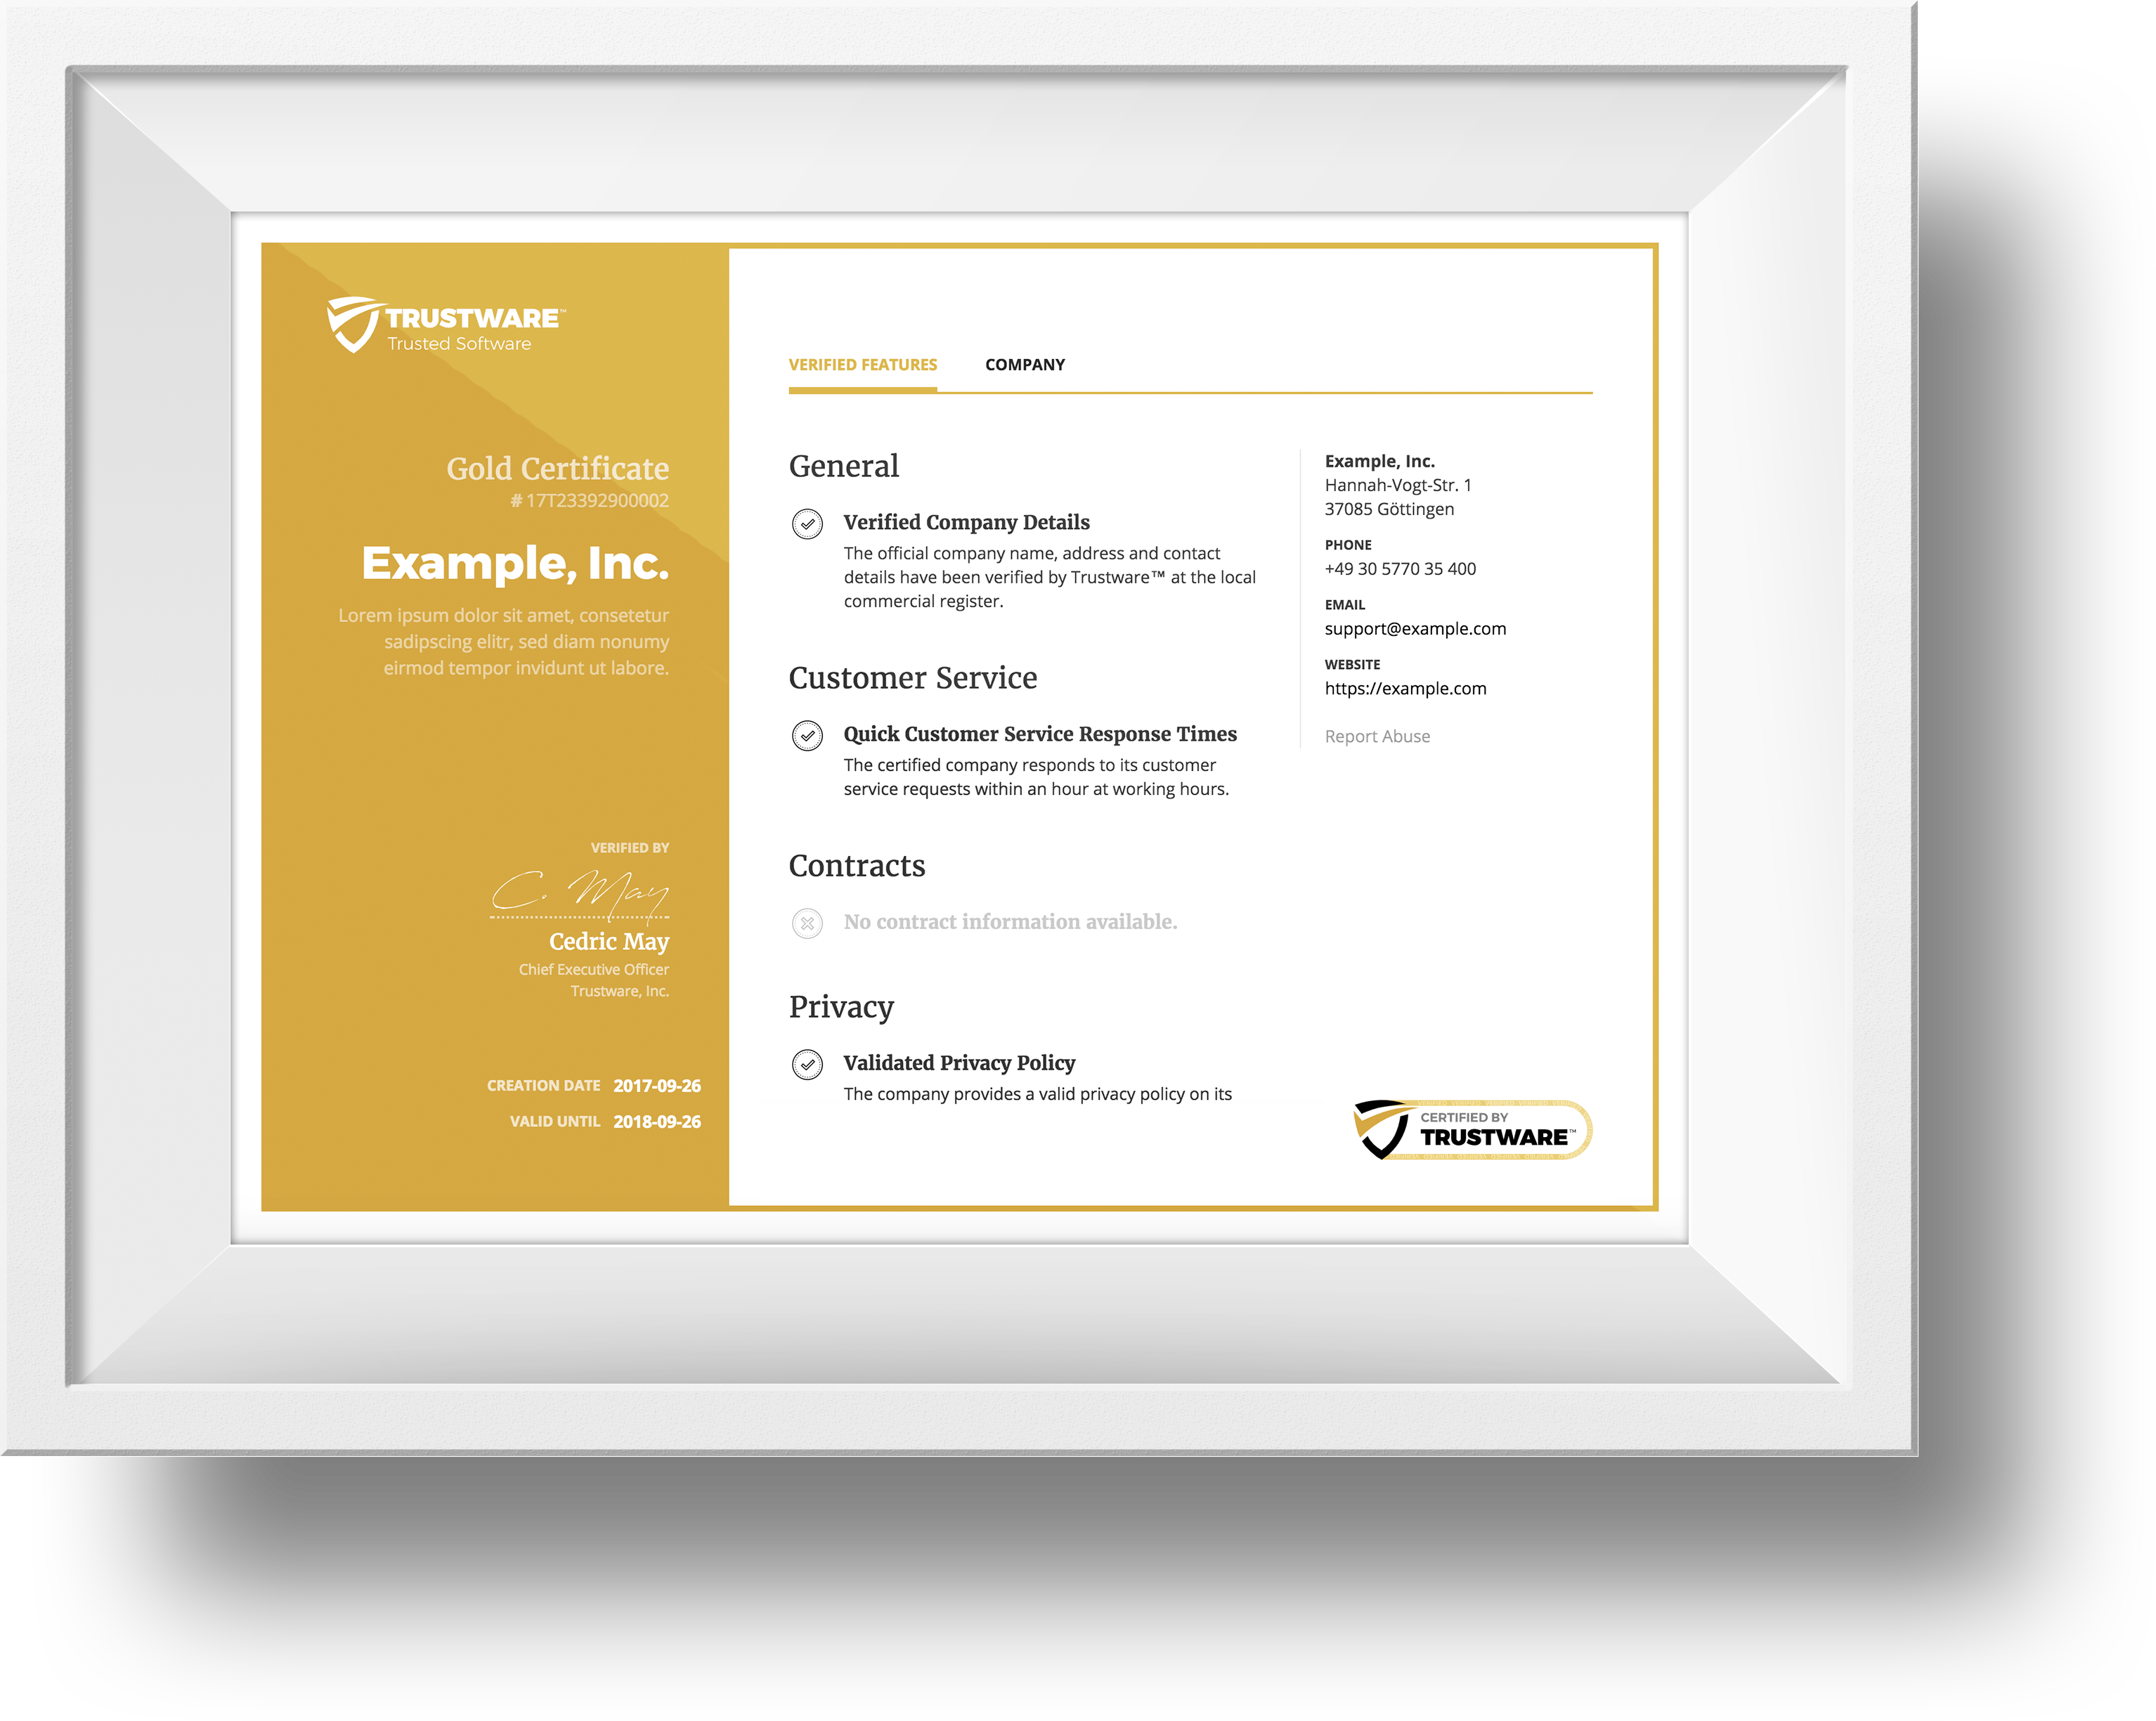 Trustware Software Certificate